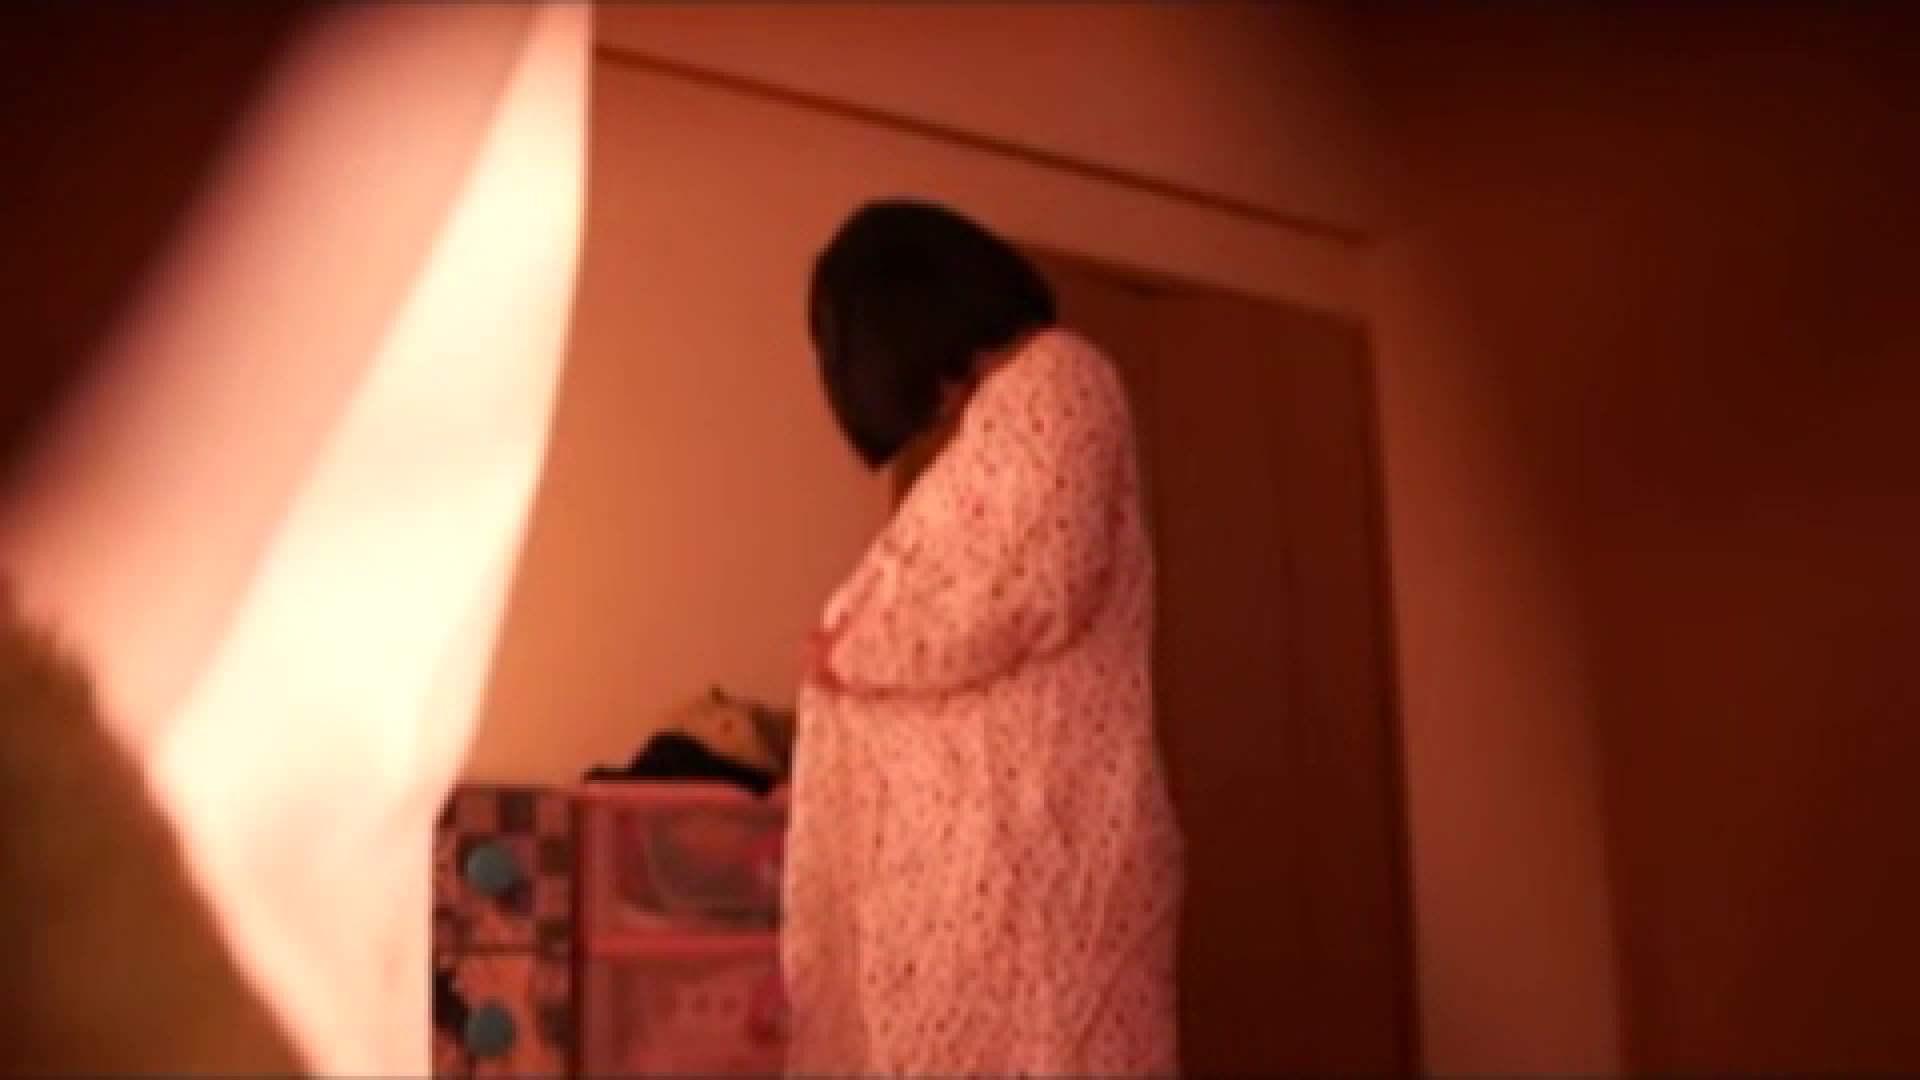 vol.2 まりこさんのお着替え、就寝前の映像です。 アラ30 戯れ無修正画像 71画像 58